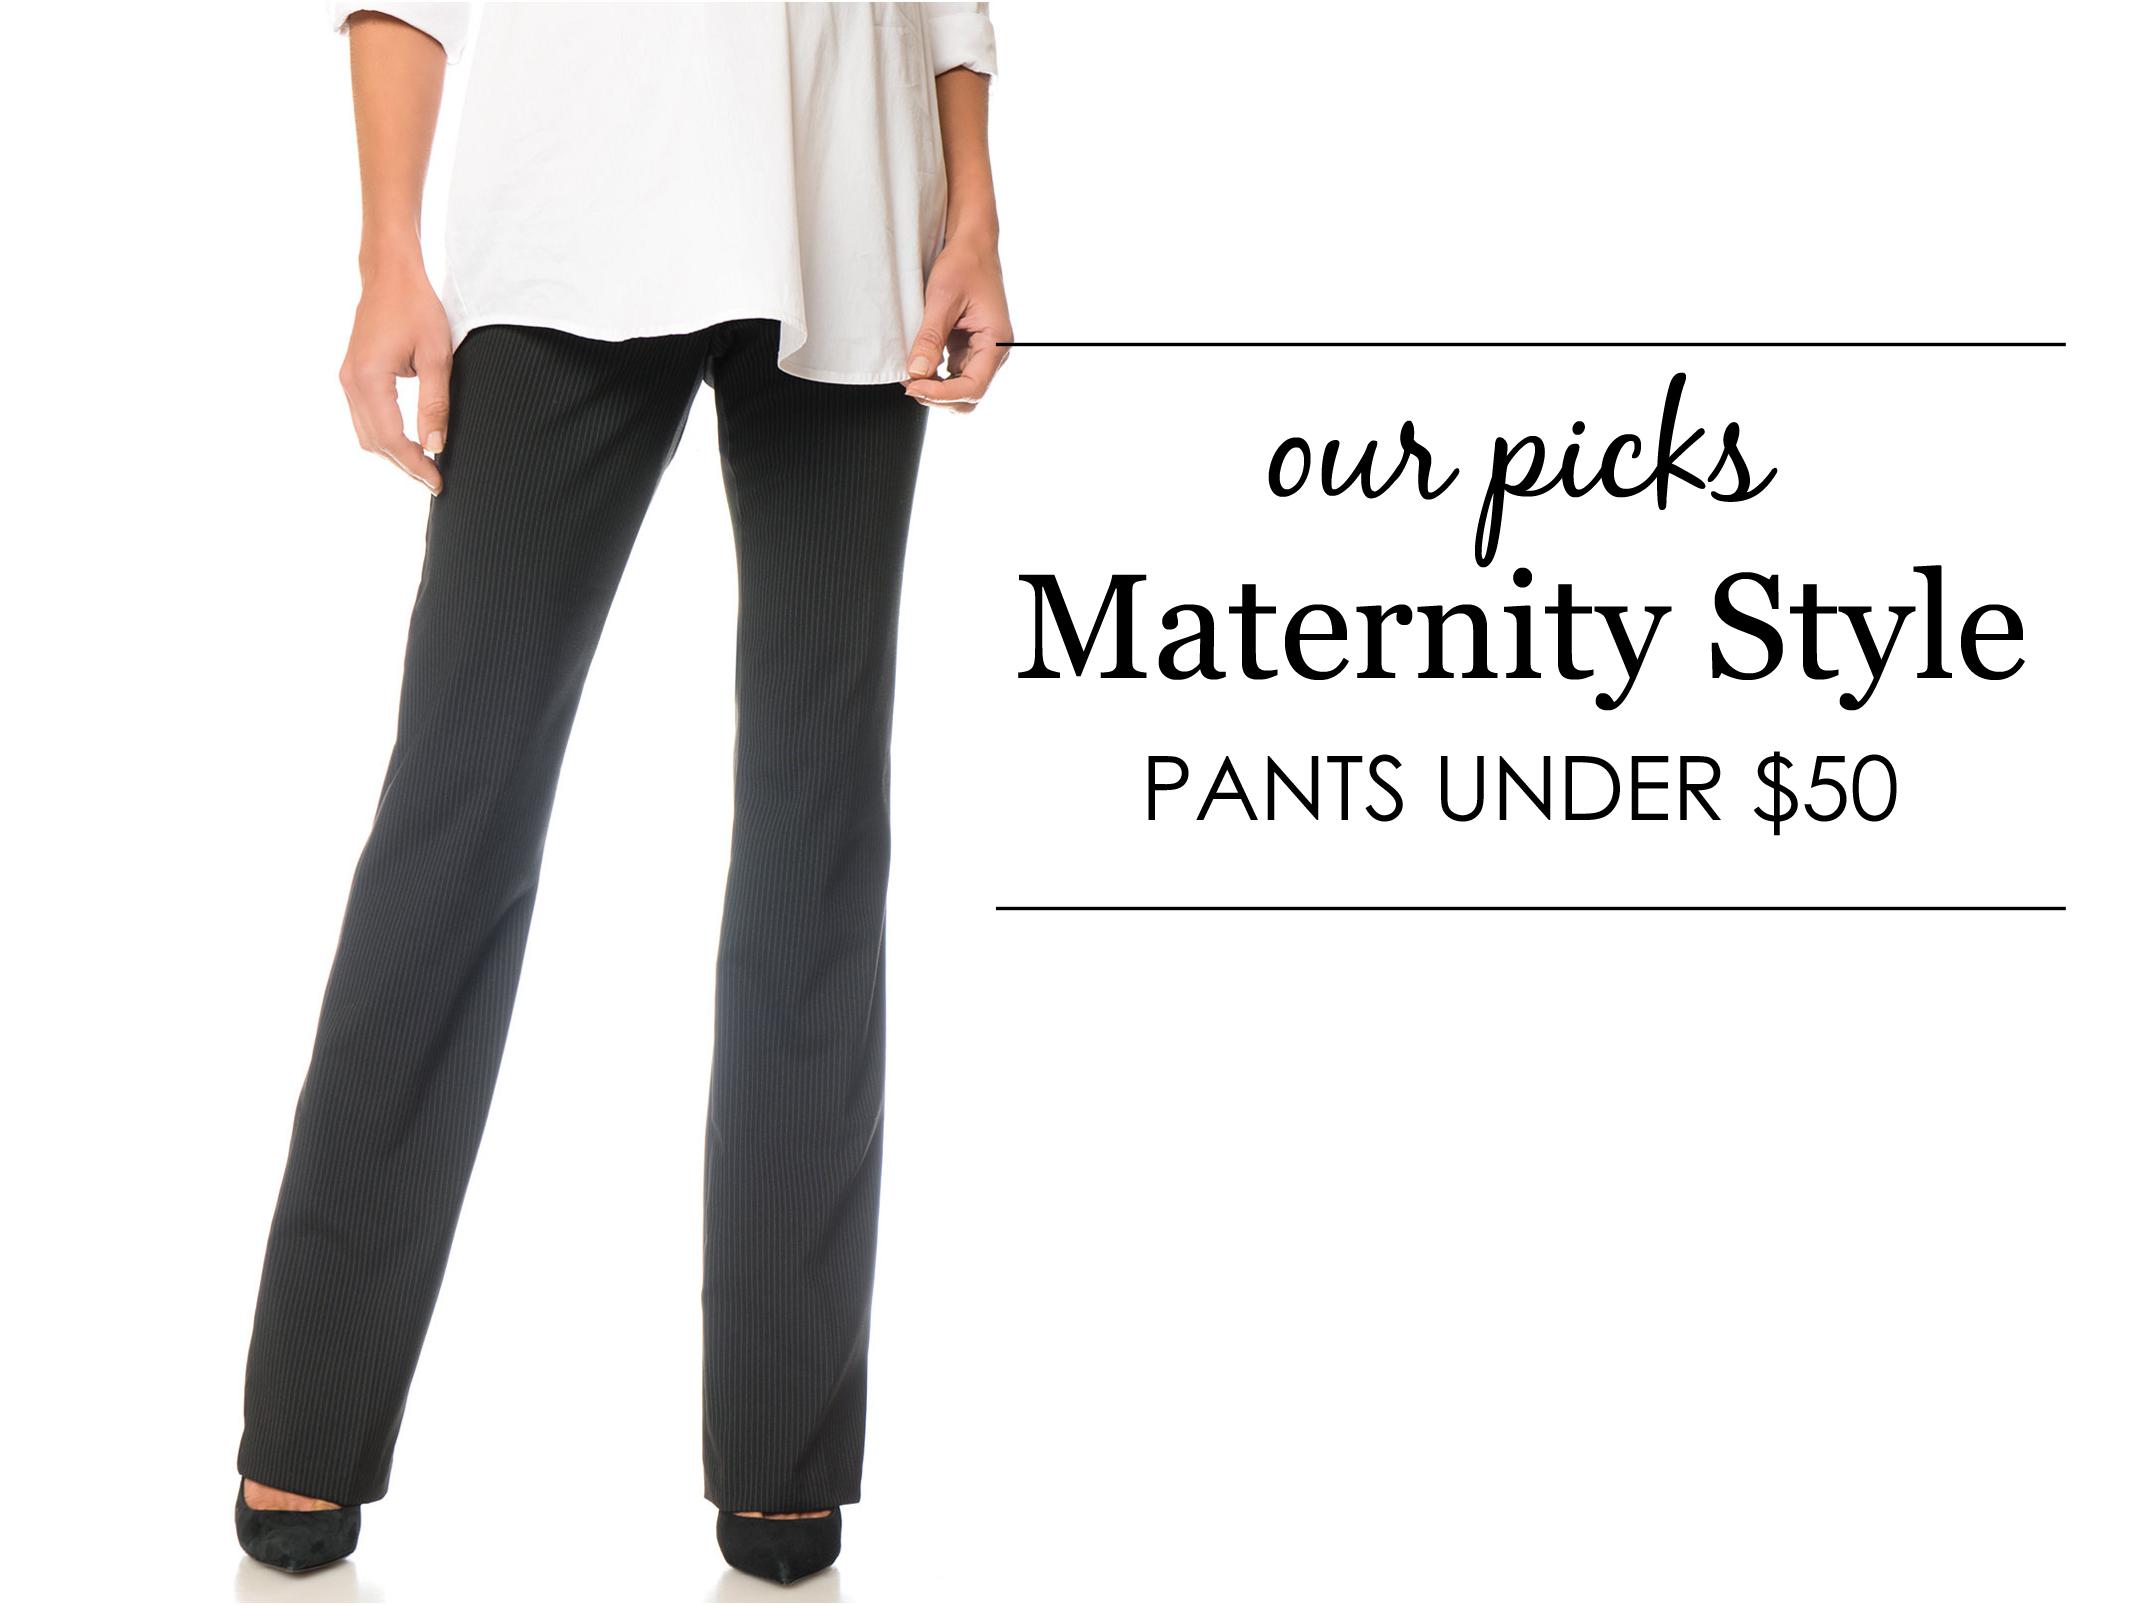 Maternity Pants Under $50